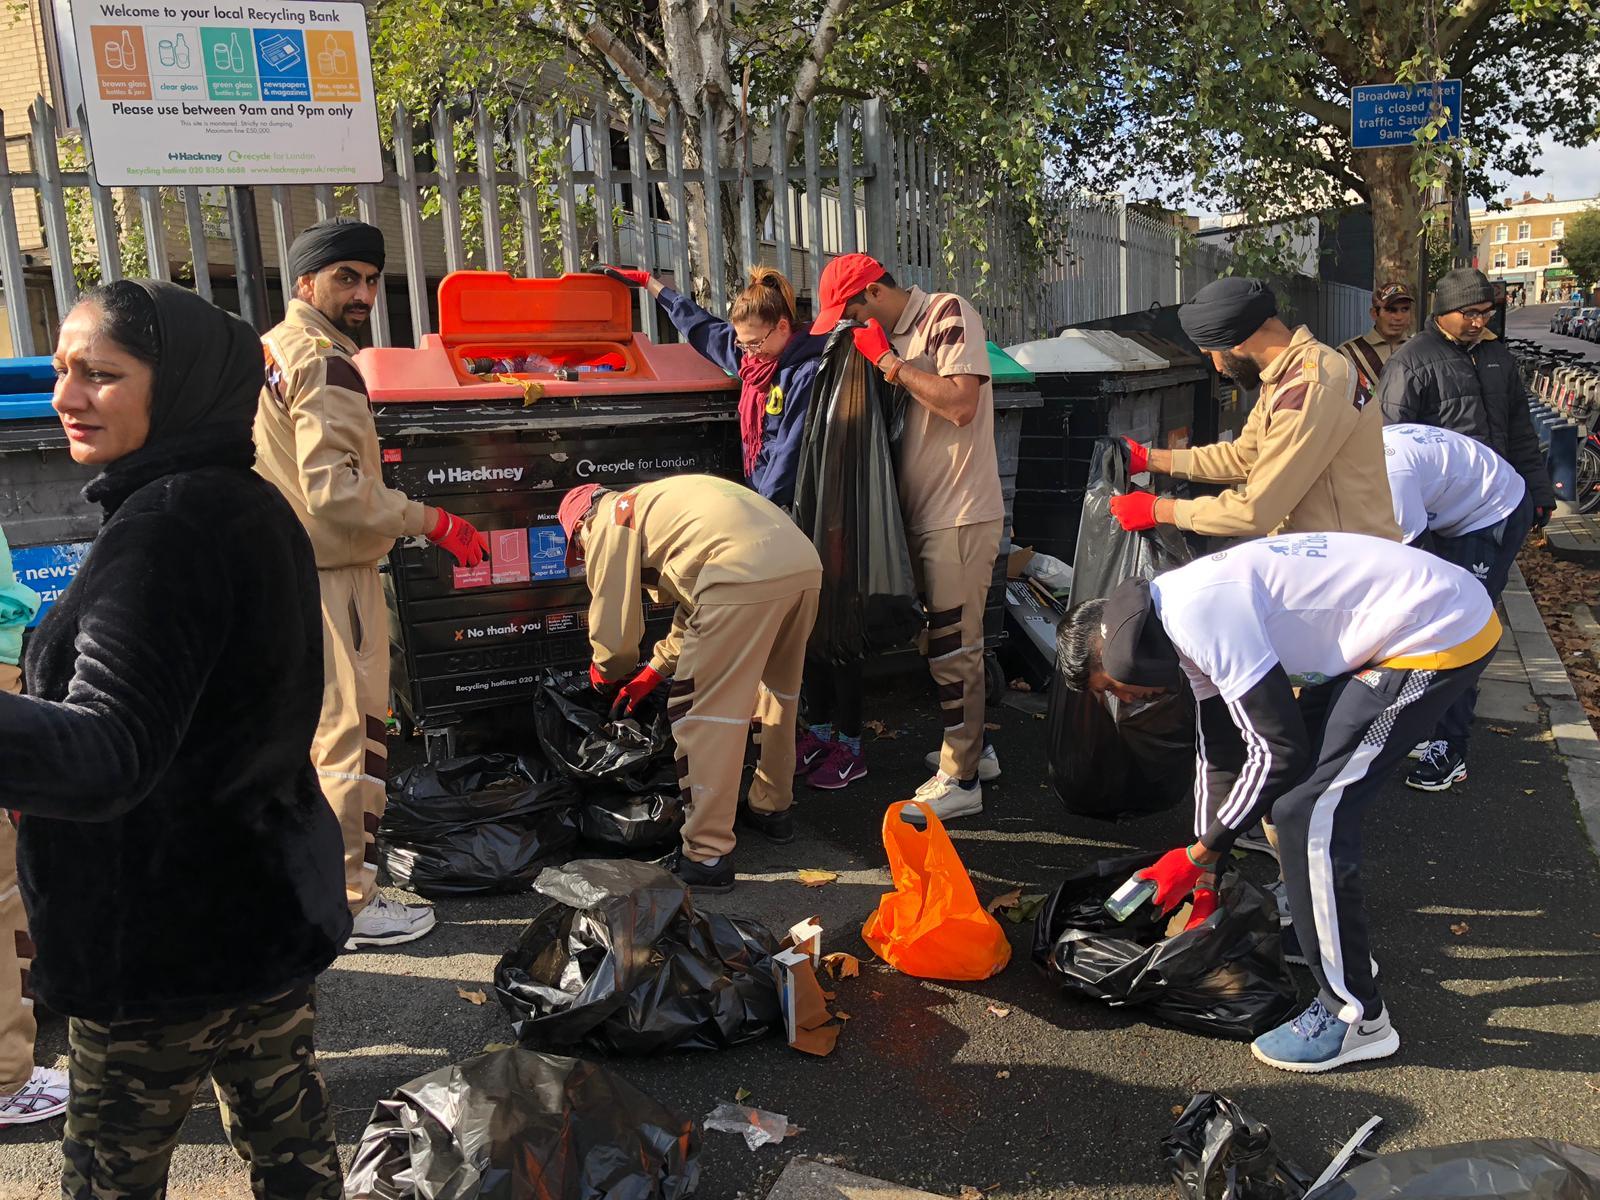 Sadh Sangat runs a public cleaning campaign in UK